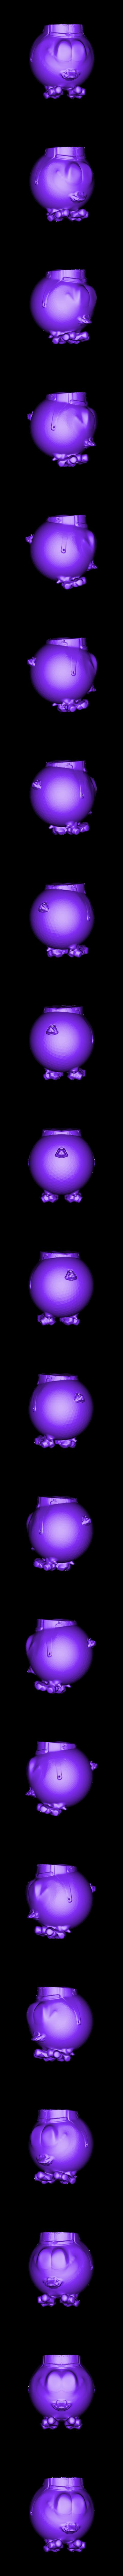 donalgrum.obj Download free OBJ file Donalgrum (boy duck series minitoys) • 3D printing model, Majin59